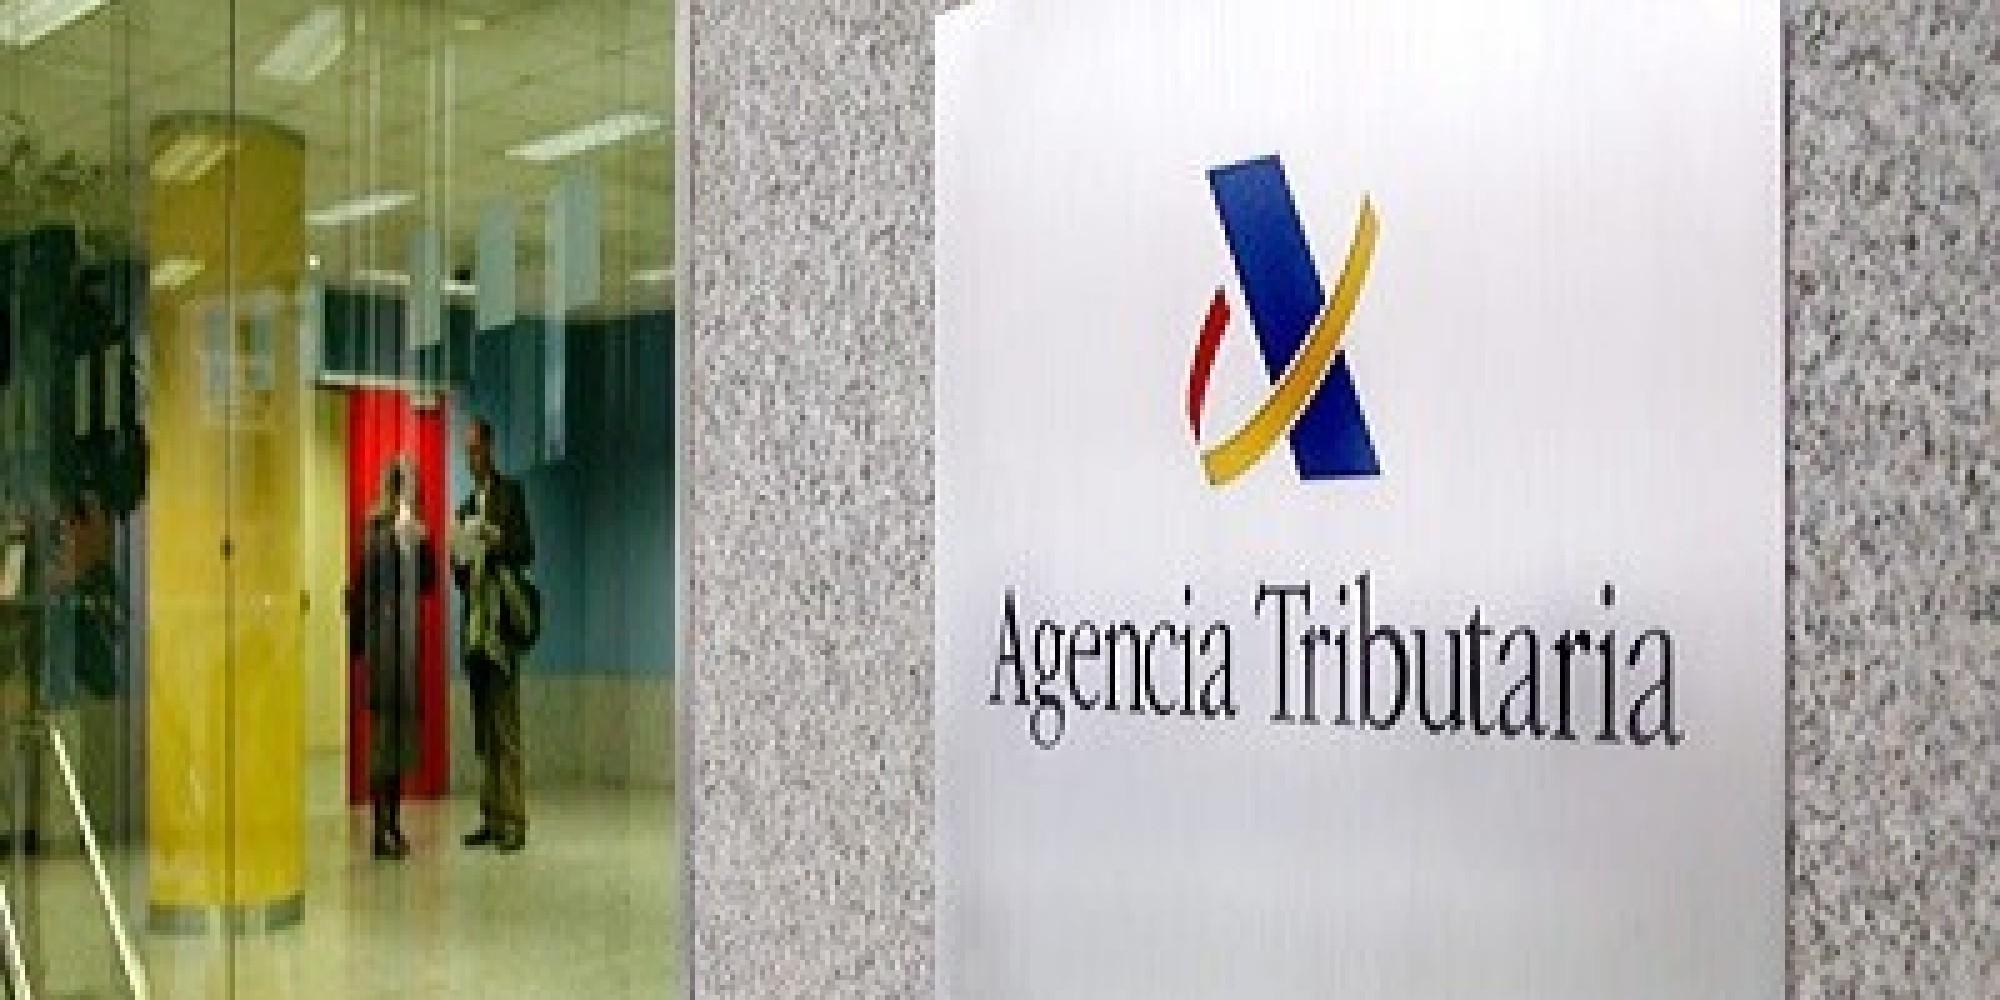 o-AGENCIA-TRIBUTARIA-facebook